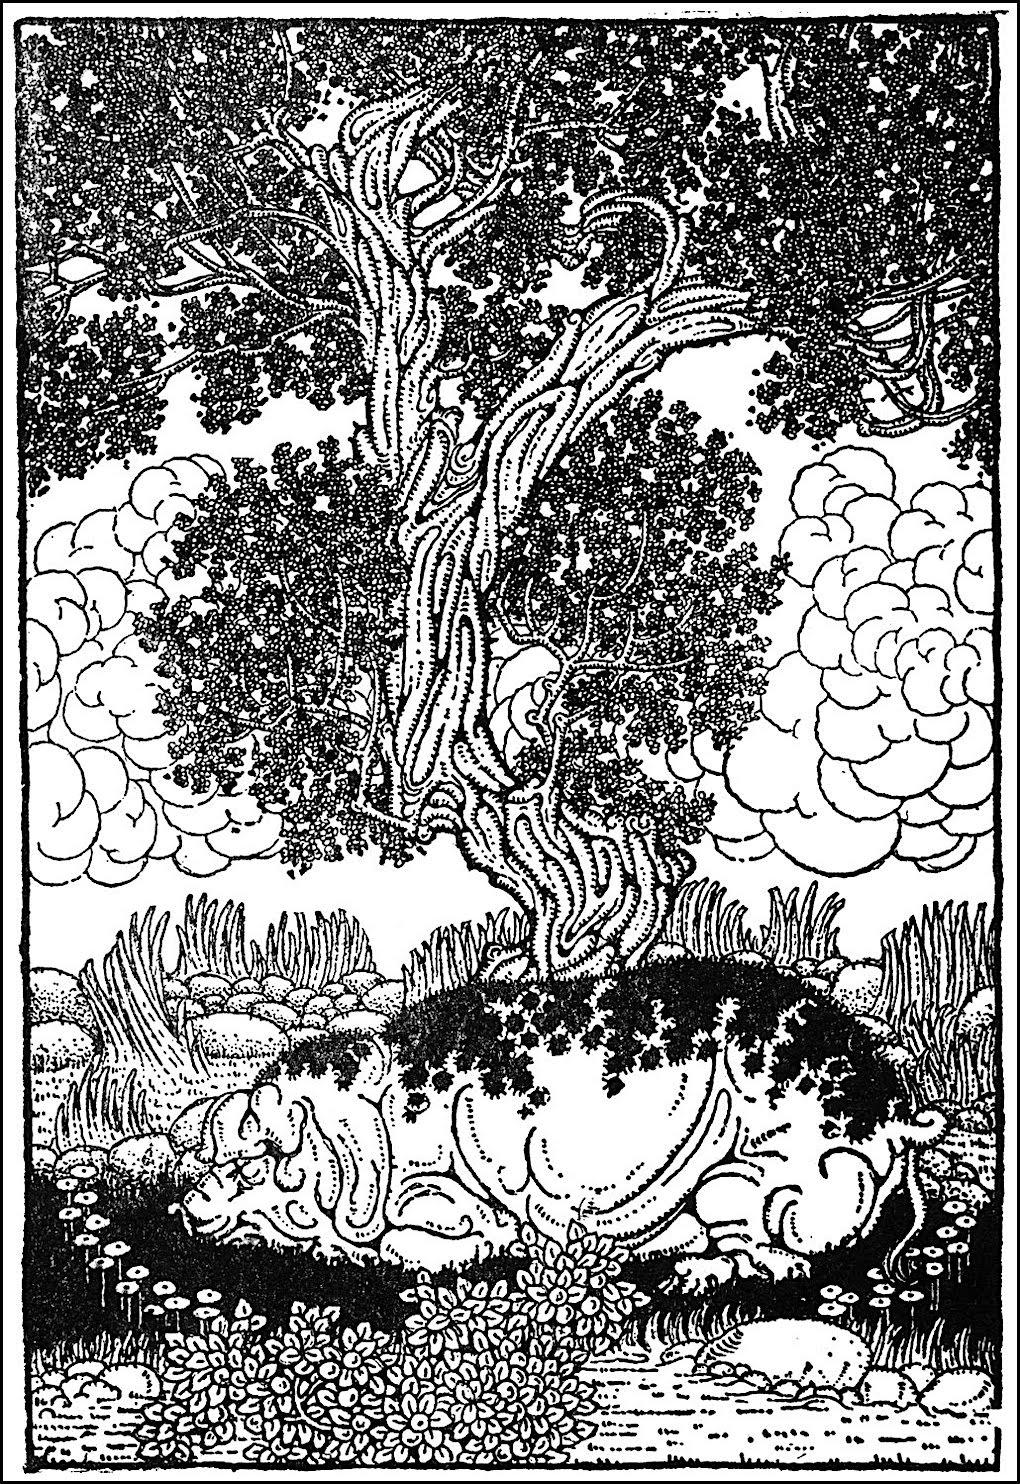 Dugold Stewart Walker, hog sleeping in shade